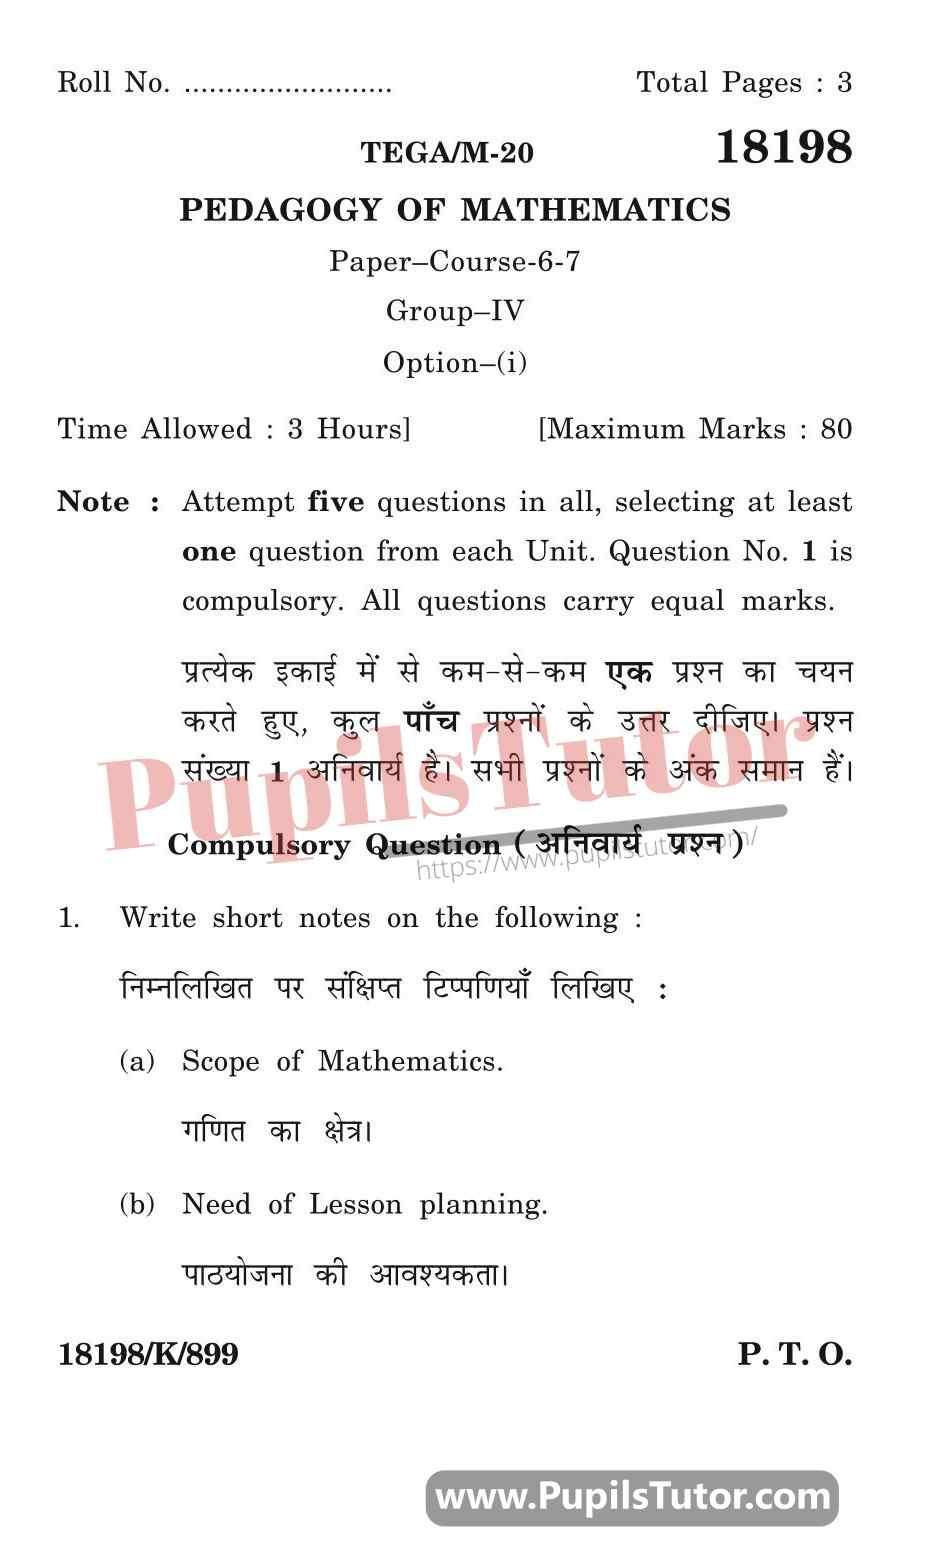 KUK (Kurukshetra University, Haryana) Pedagogy Of Mathematics Question Paper 2020 For B.Ed 1st And 2nd Year And All The 4 Semesters In English And Hindi Medium Free Download PDF